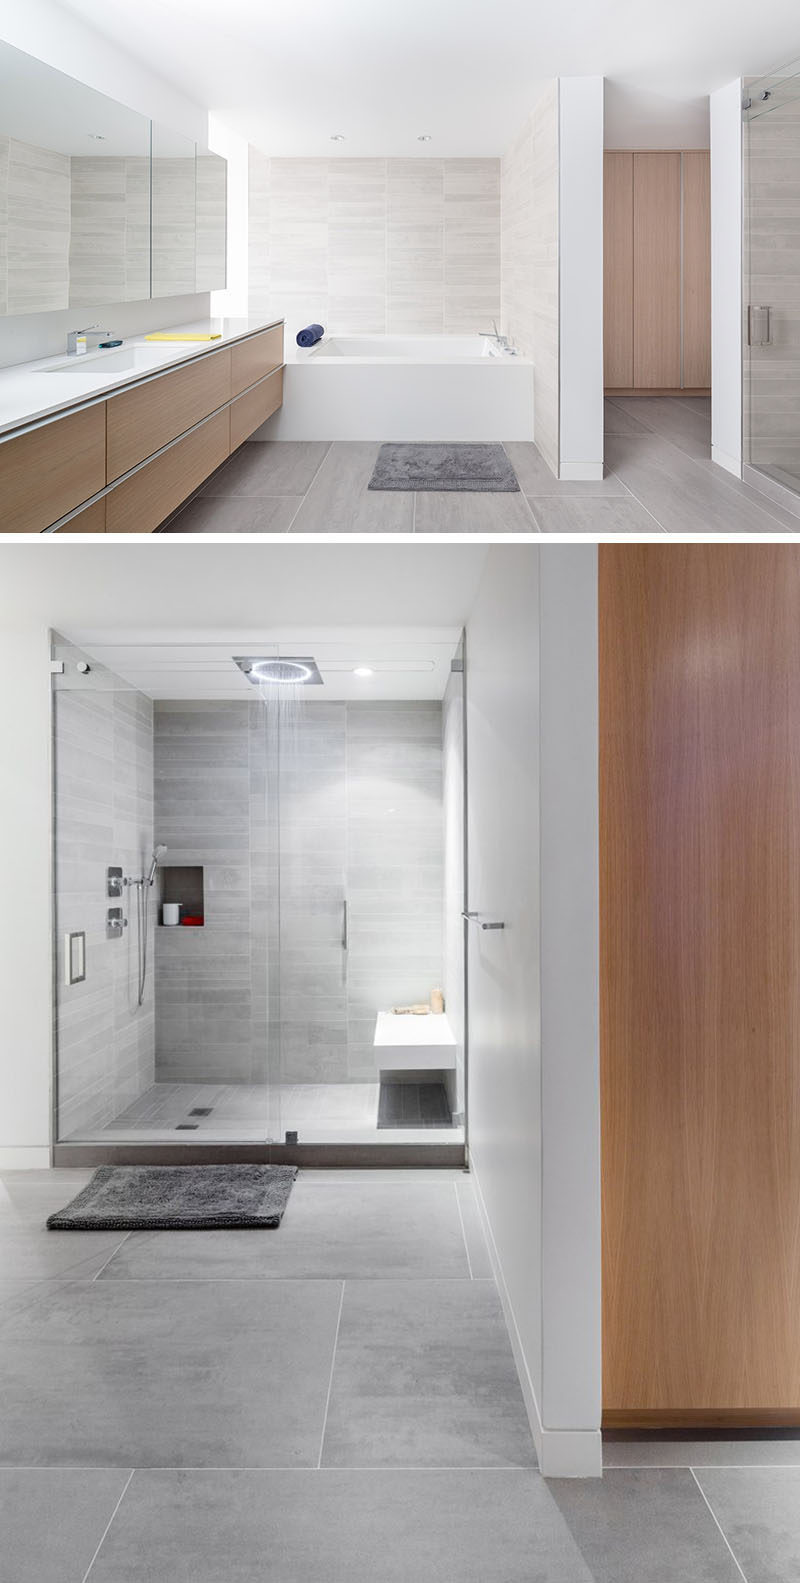 Bathroom Tile Idea  Use Large Tiles On The Floor And